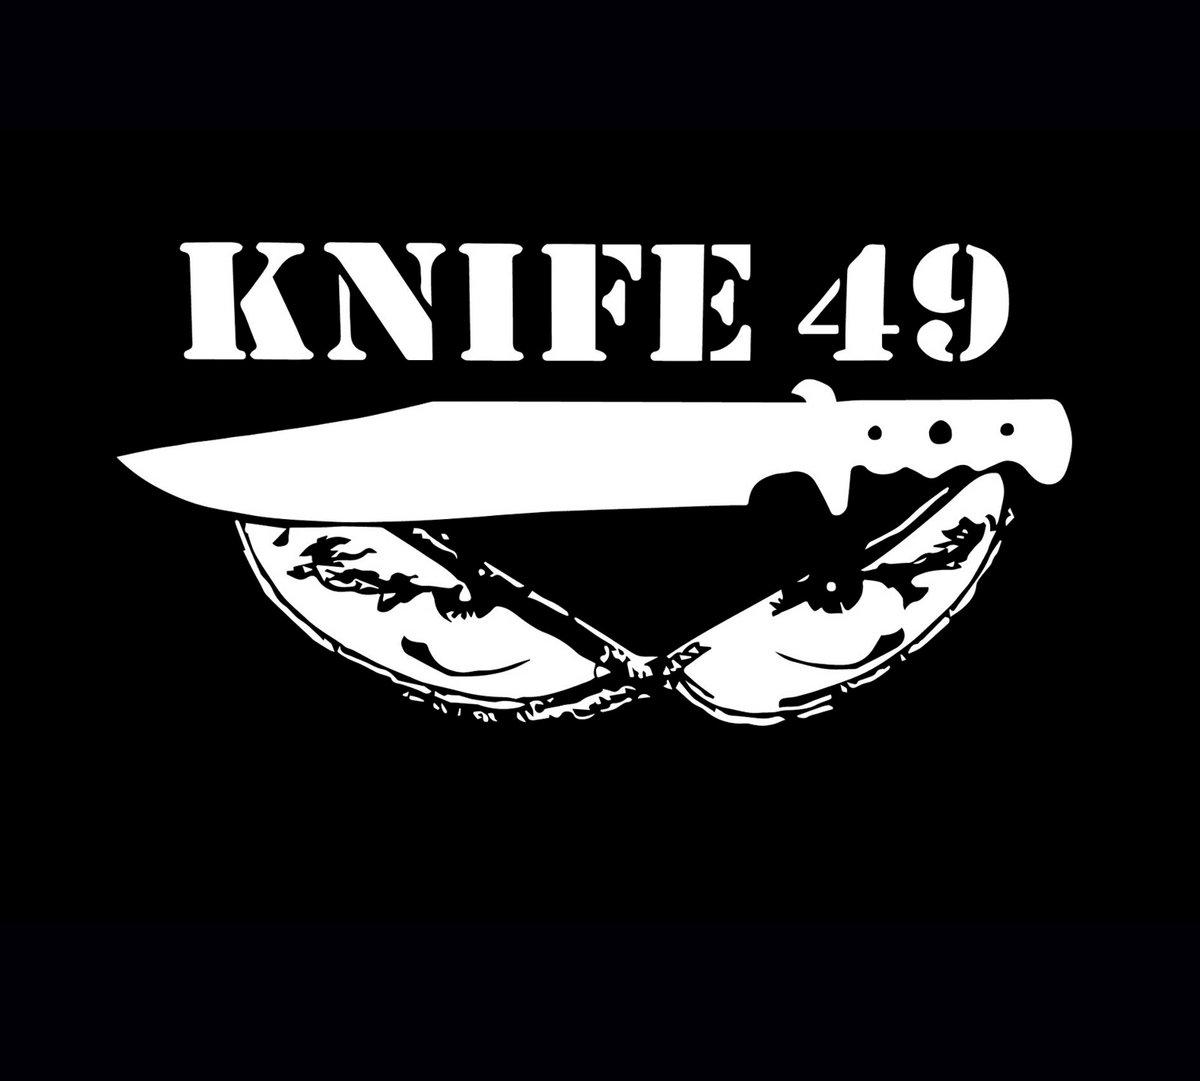 Knife 49 street punk sanremo rock teatro ariston